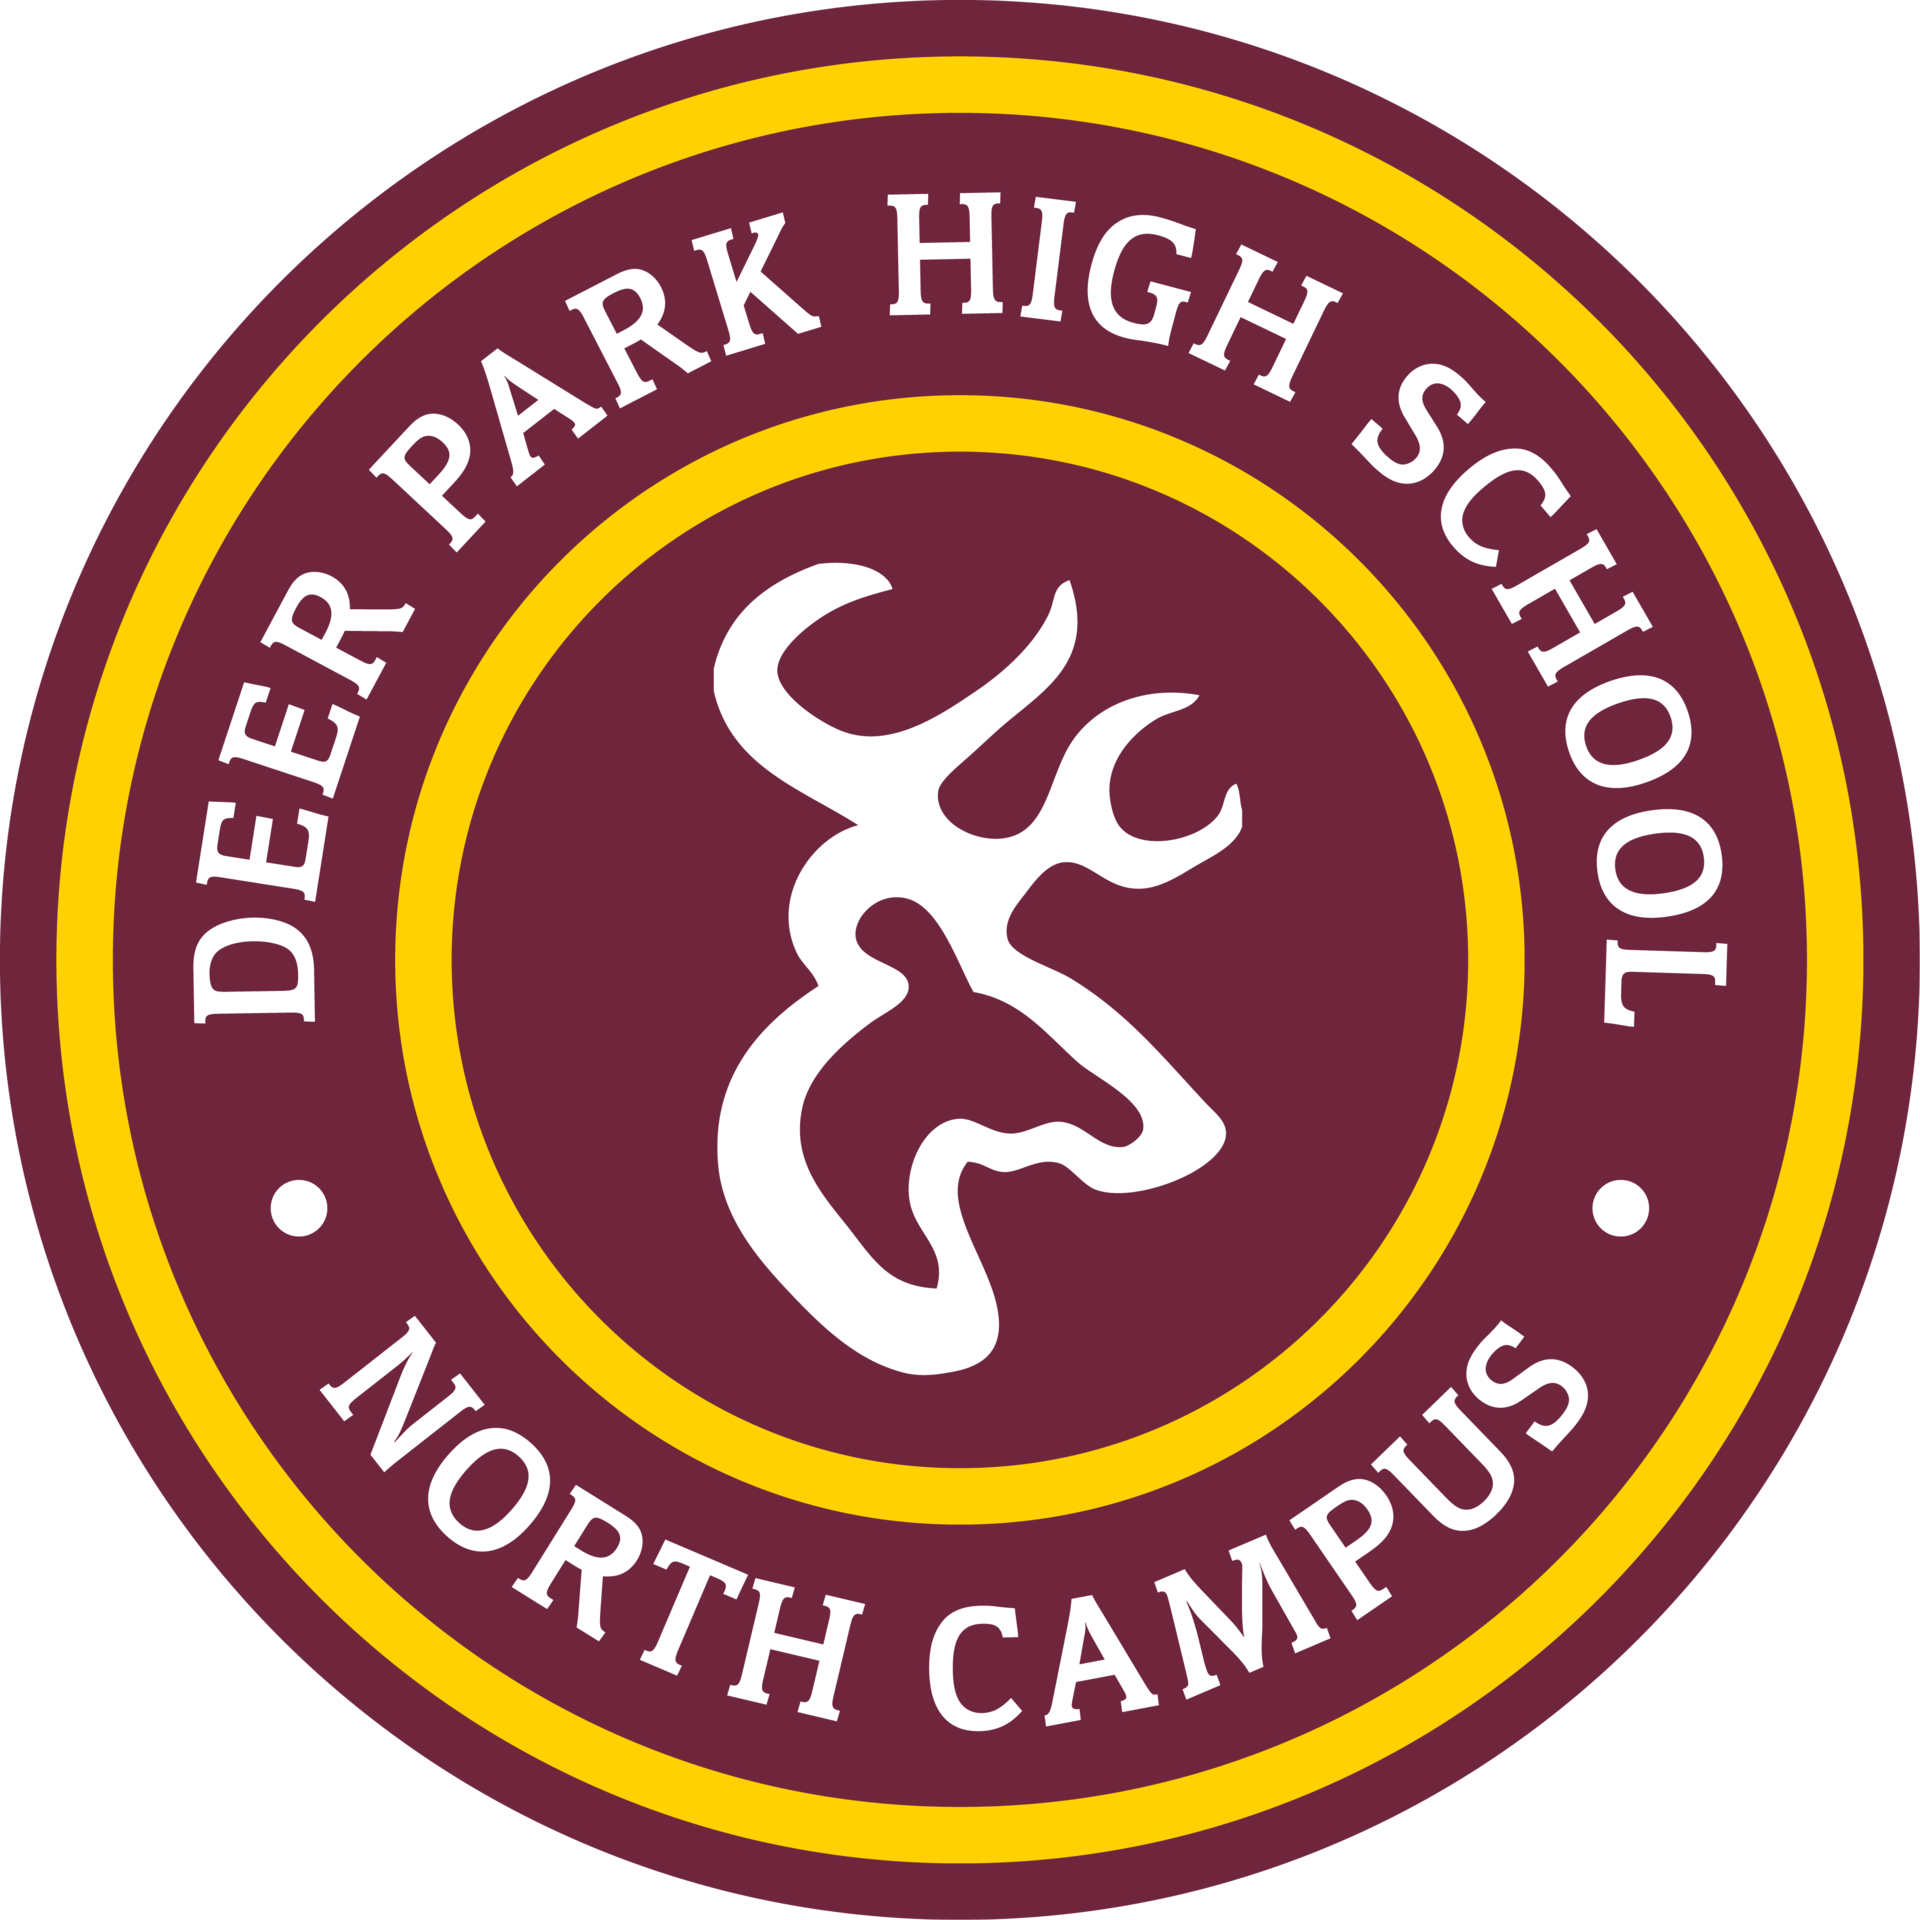 DPHS-North Campus seal